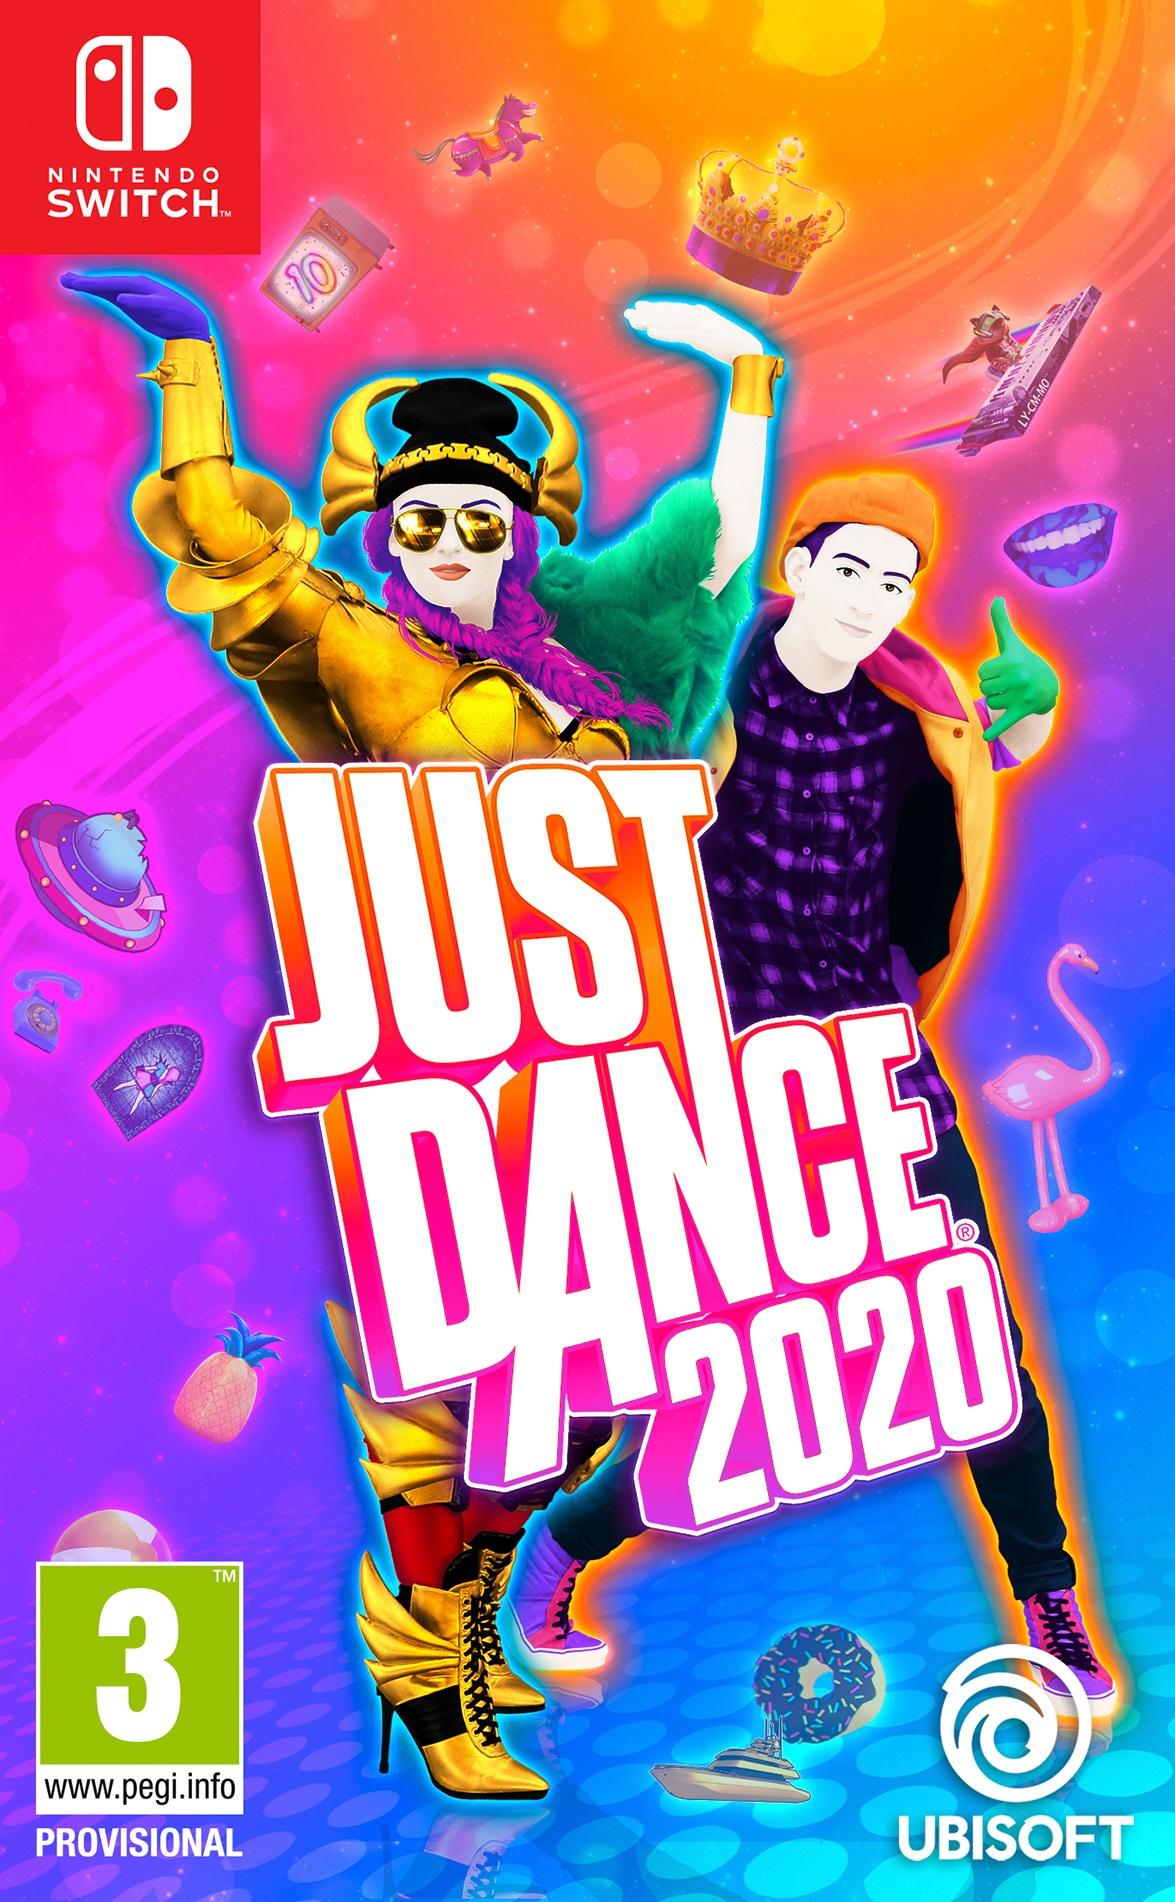 Ubisoft Gioco adatto modello switch - Switch Just Dance 2020